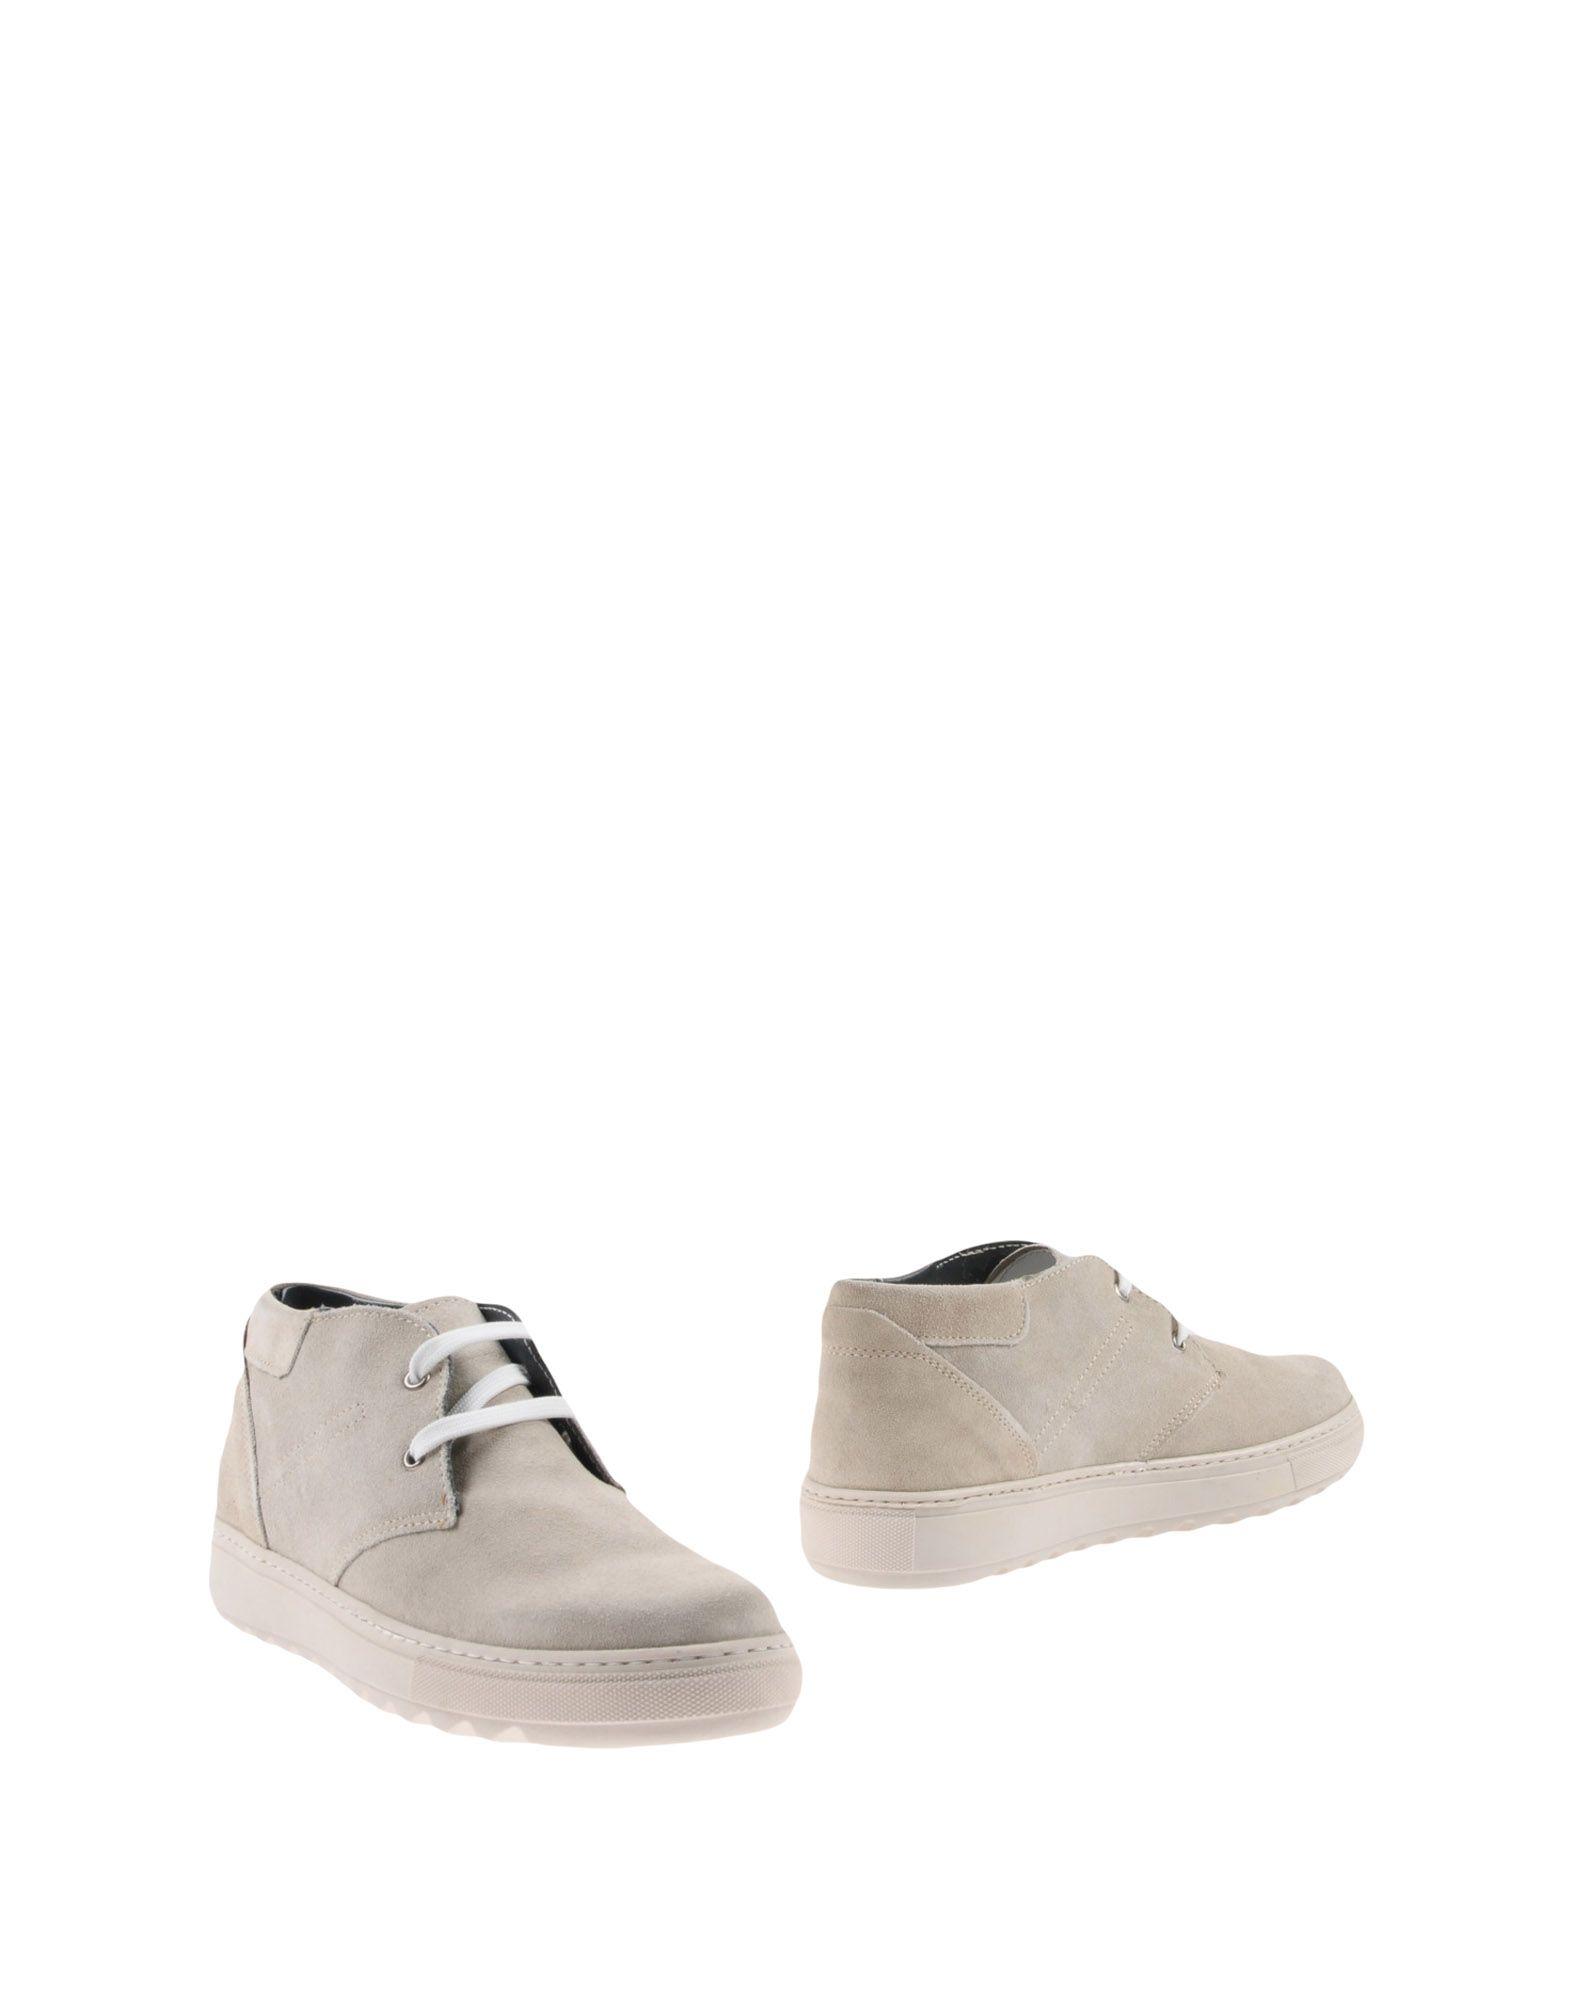 Rabatt echte Schuhe Roberto Della Croce Stiefelette Herren  11435013BM